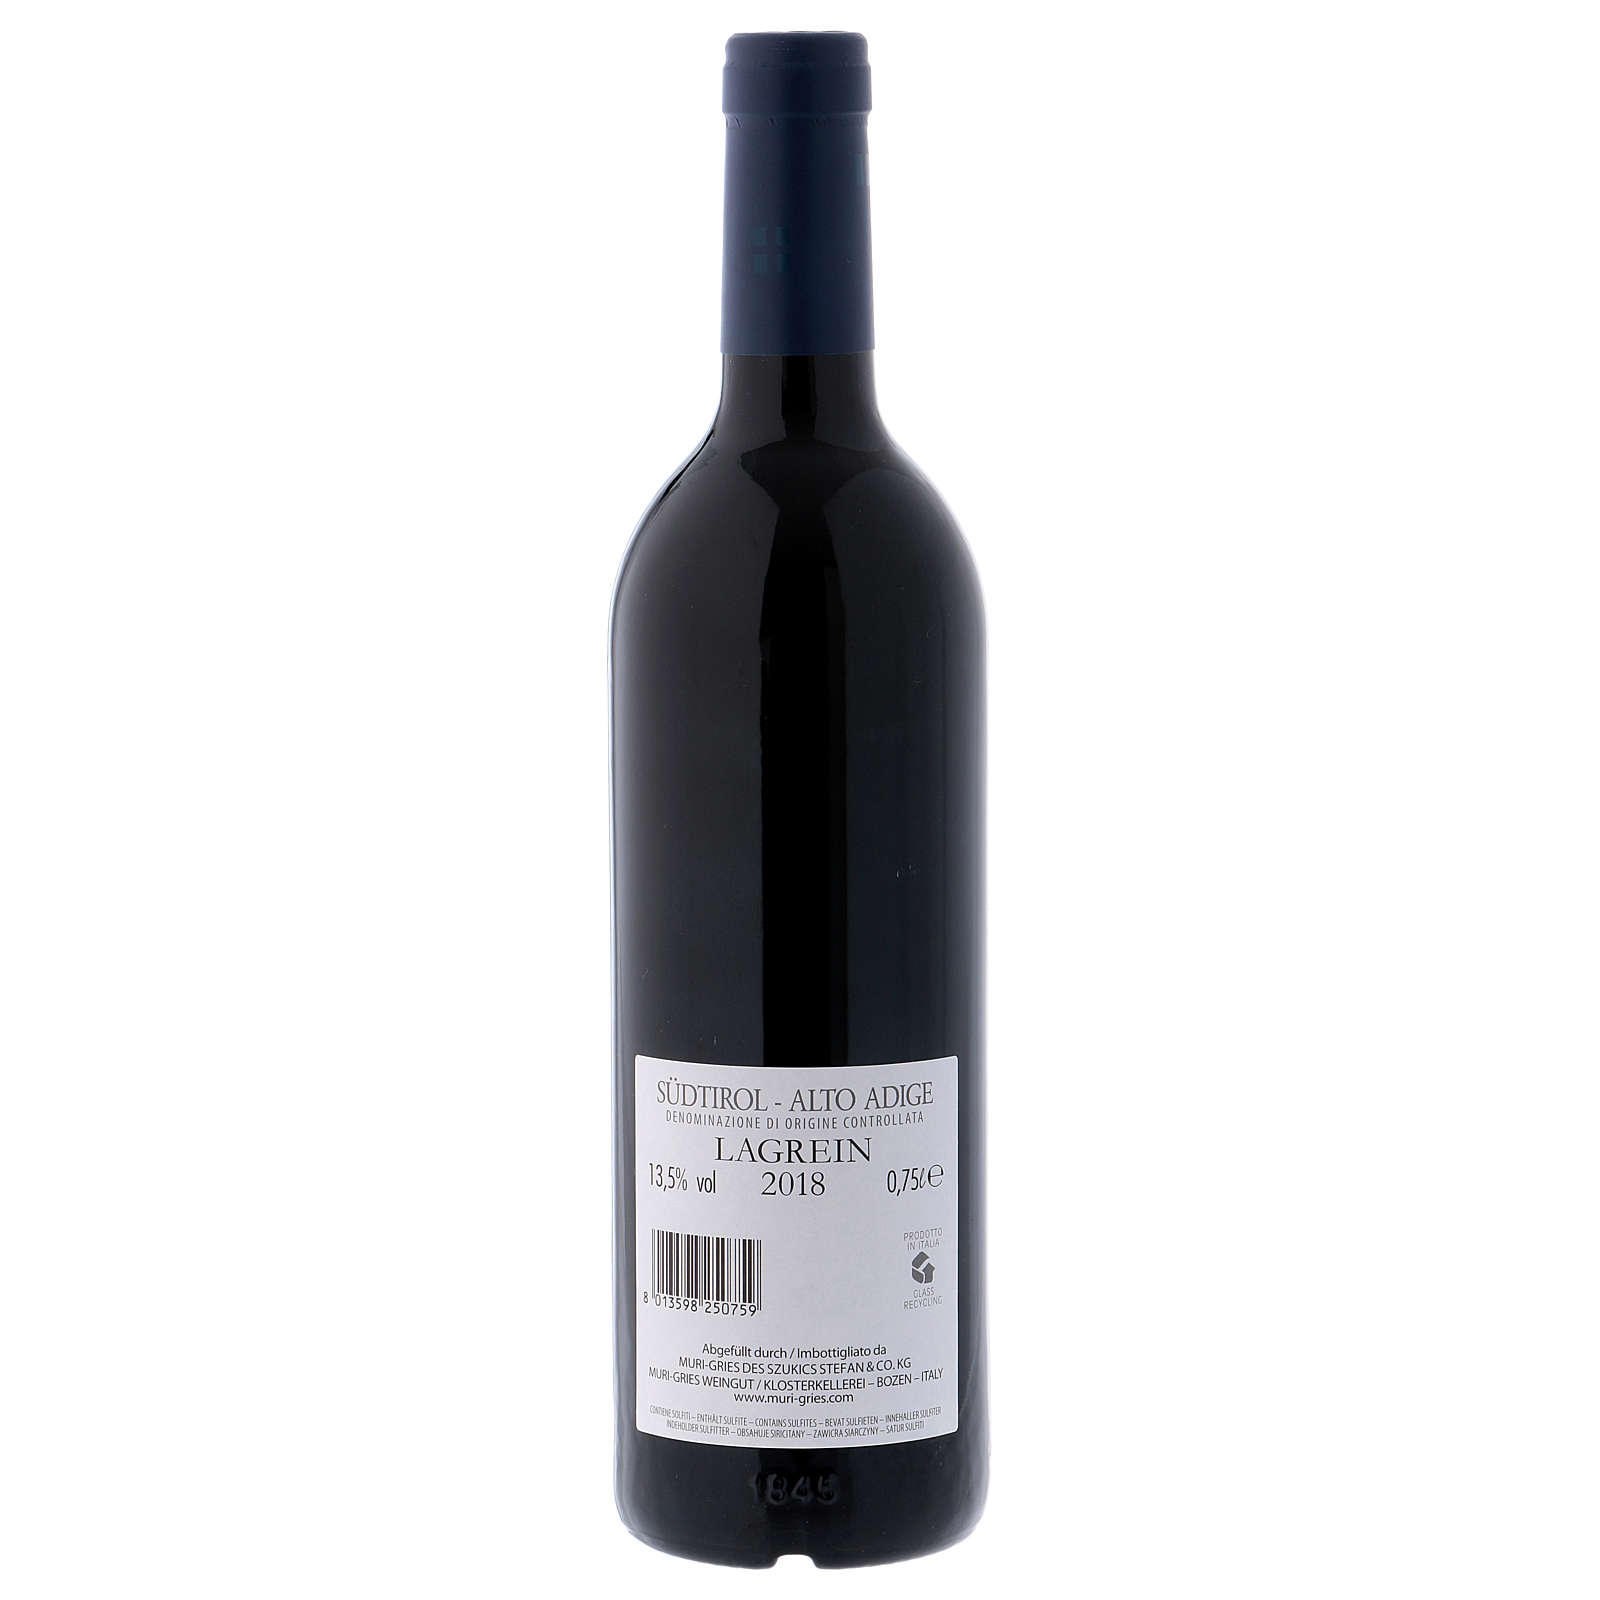 Vino Lagrein DOC 2018 Abadía Muri Gries 750 ml 3